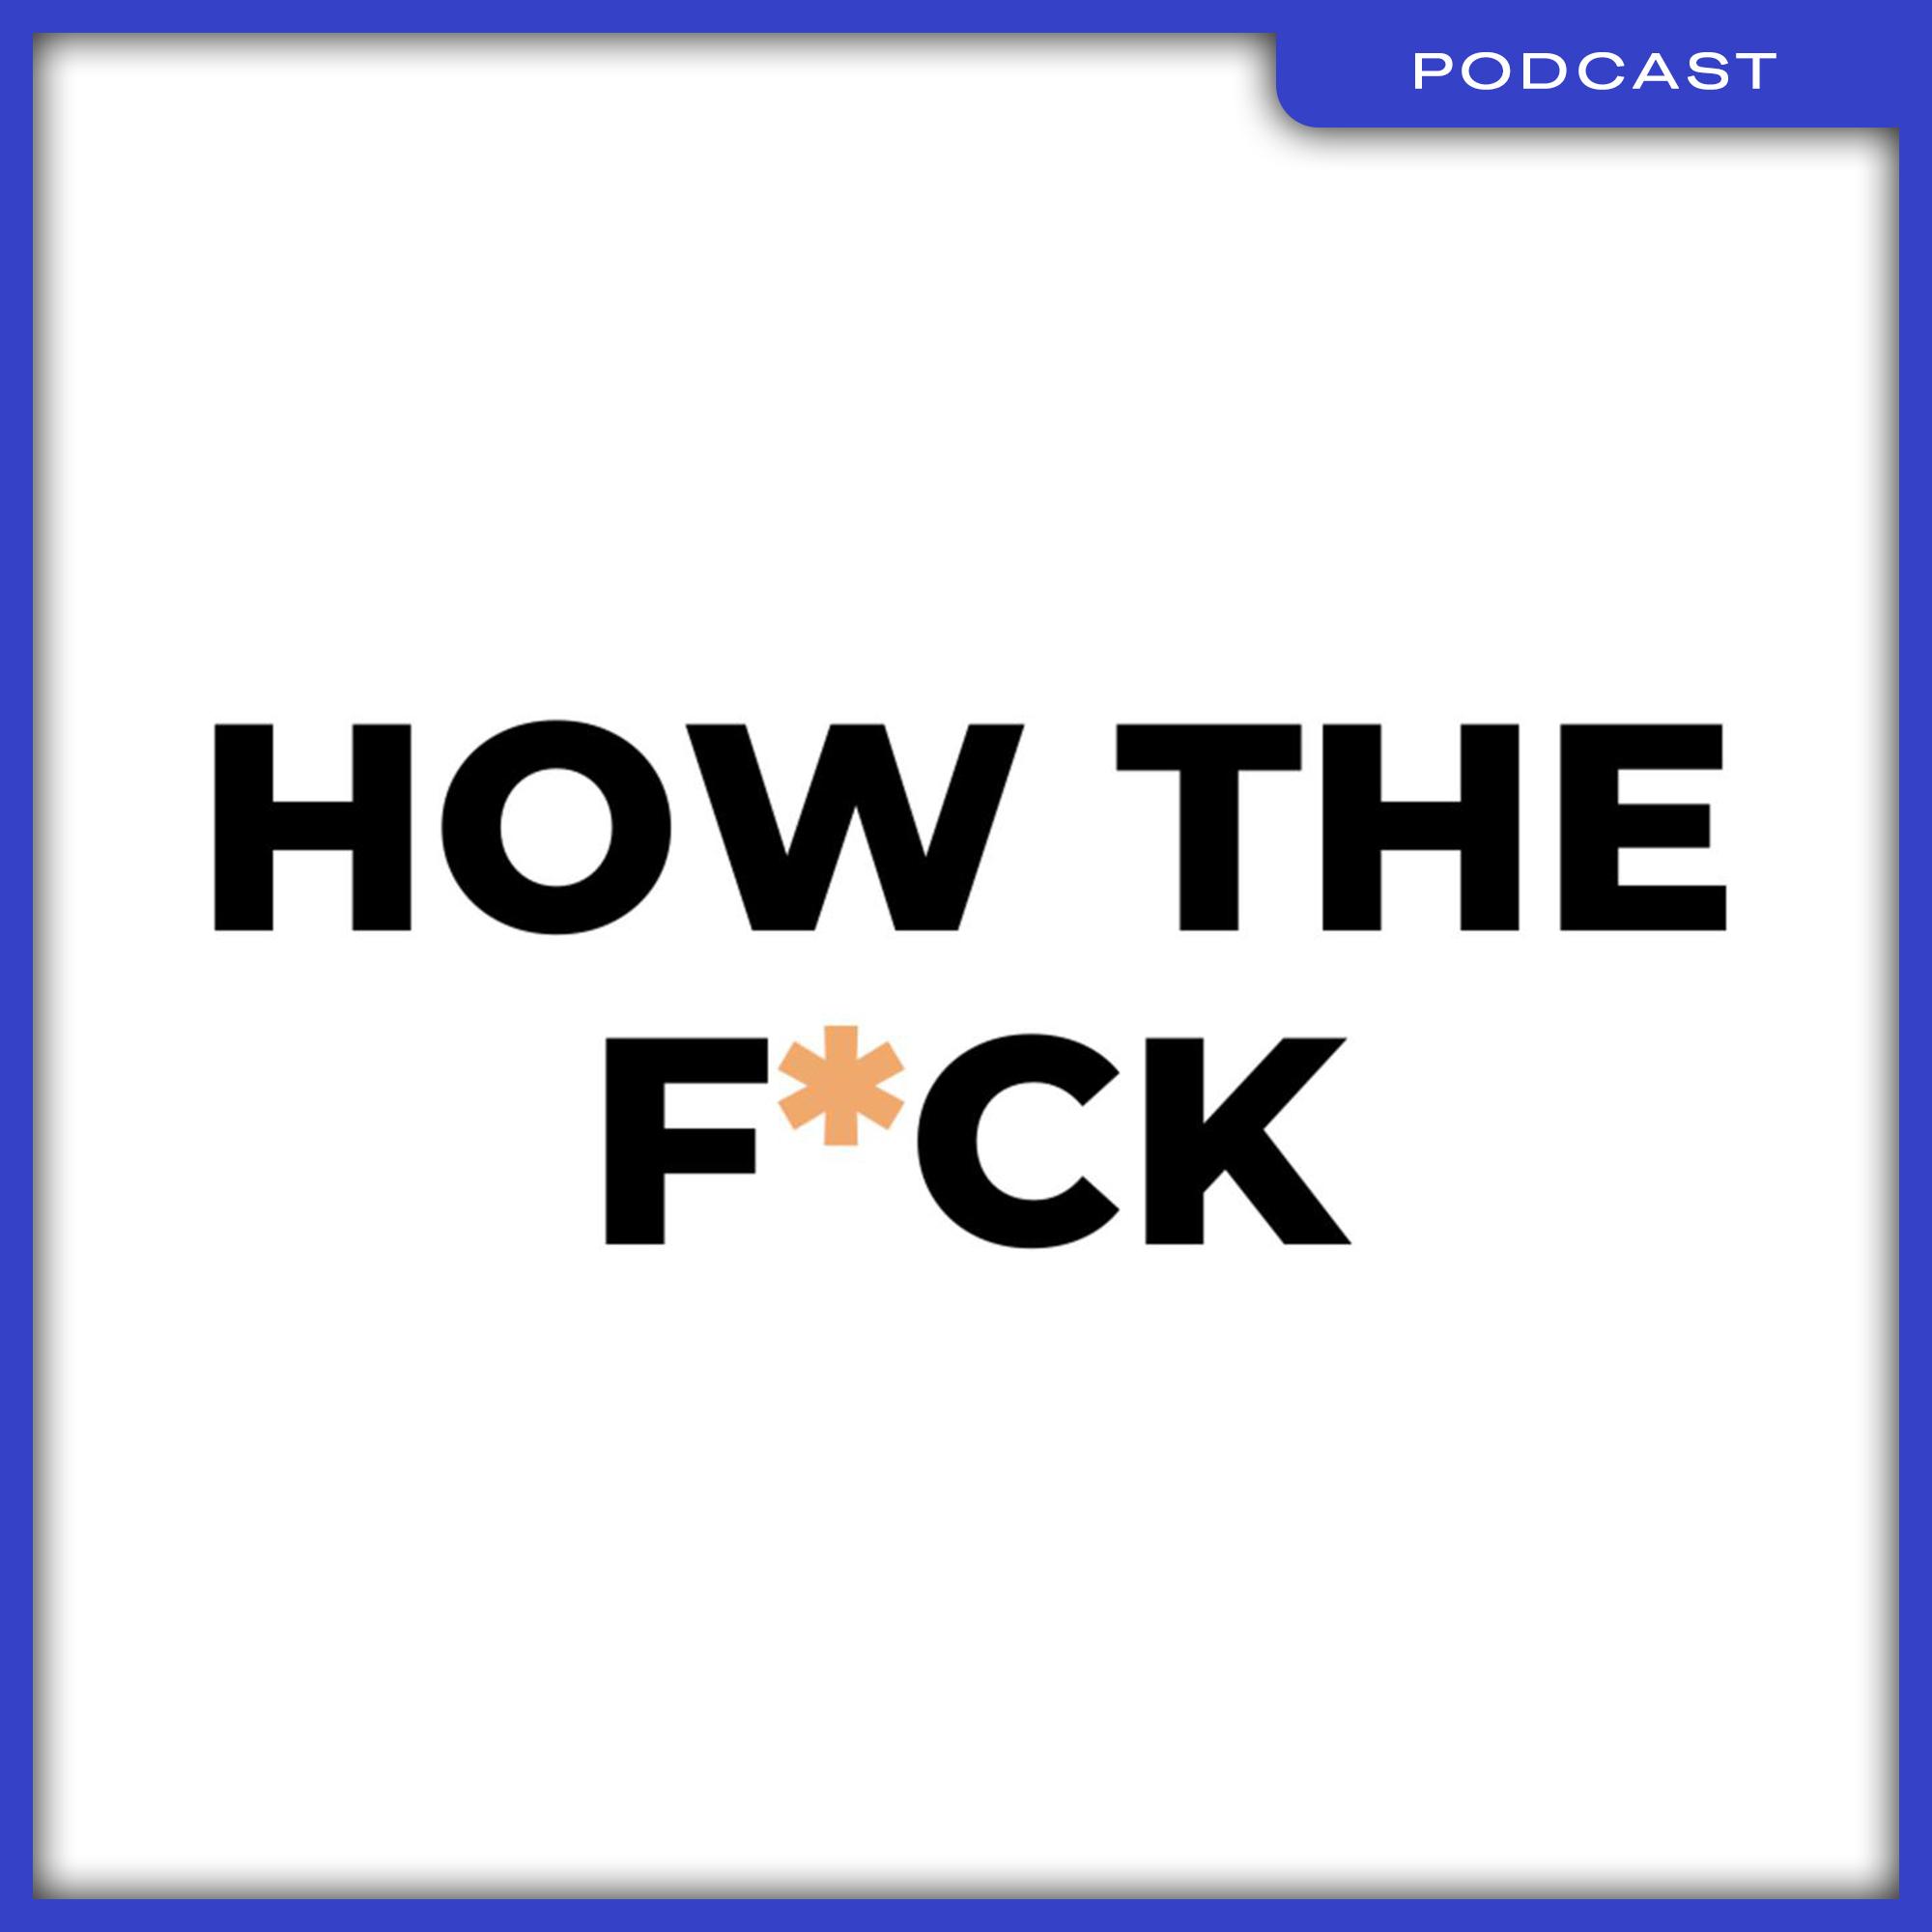 12_Podcast_HowTheFxck